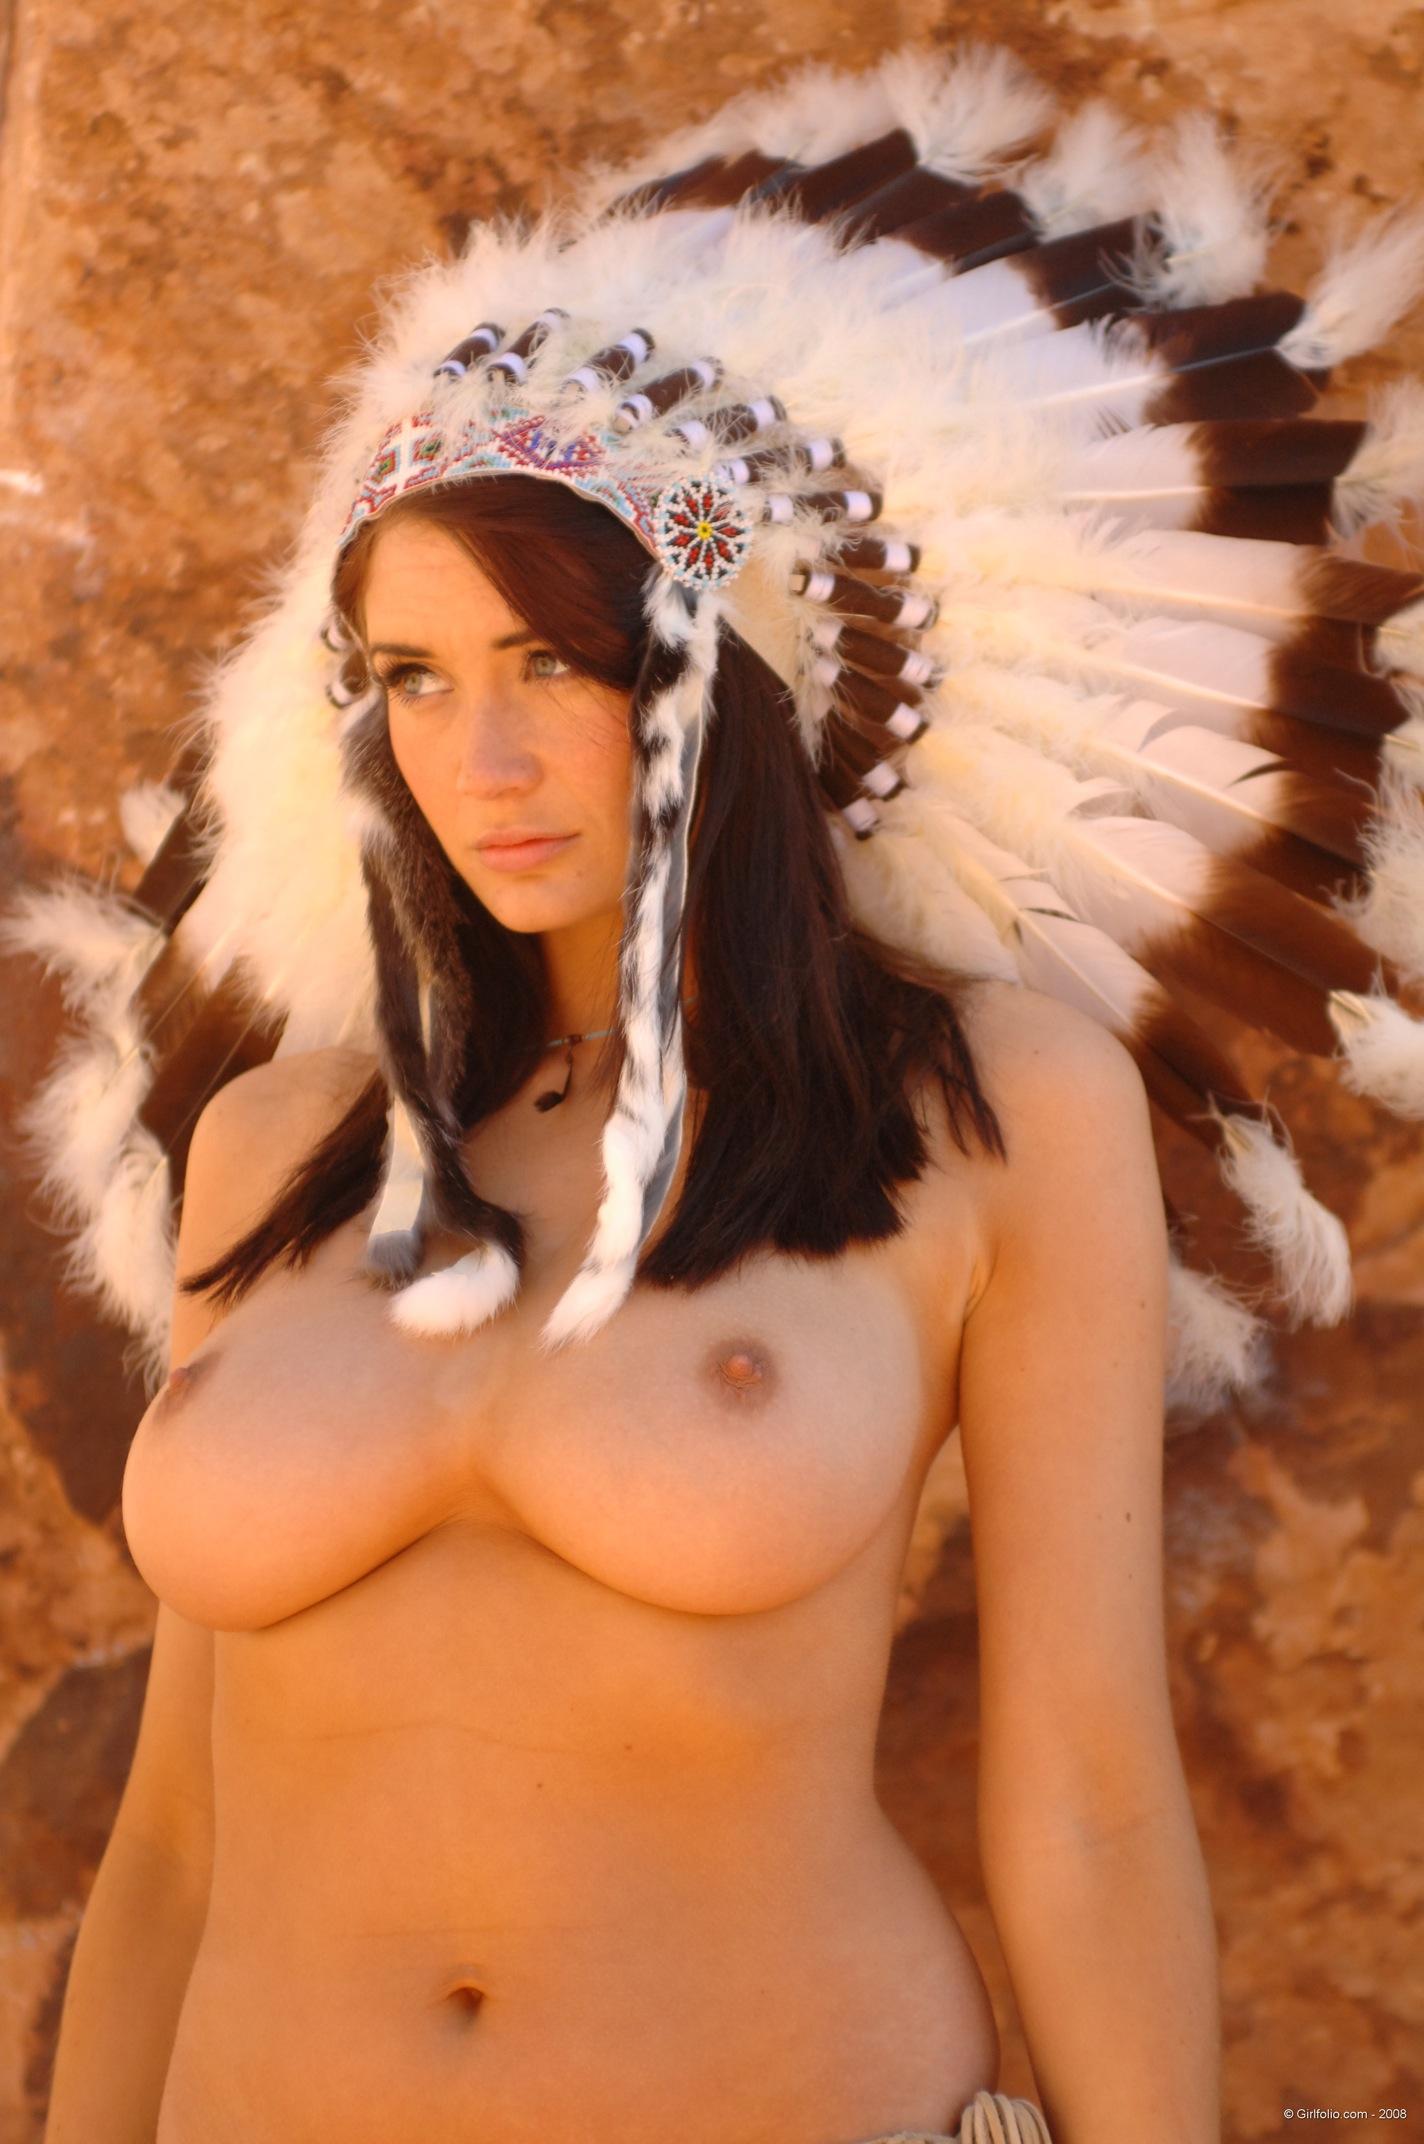 Busty native american women porn